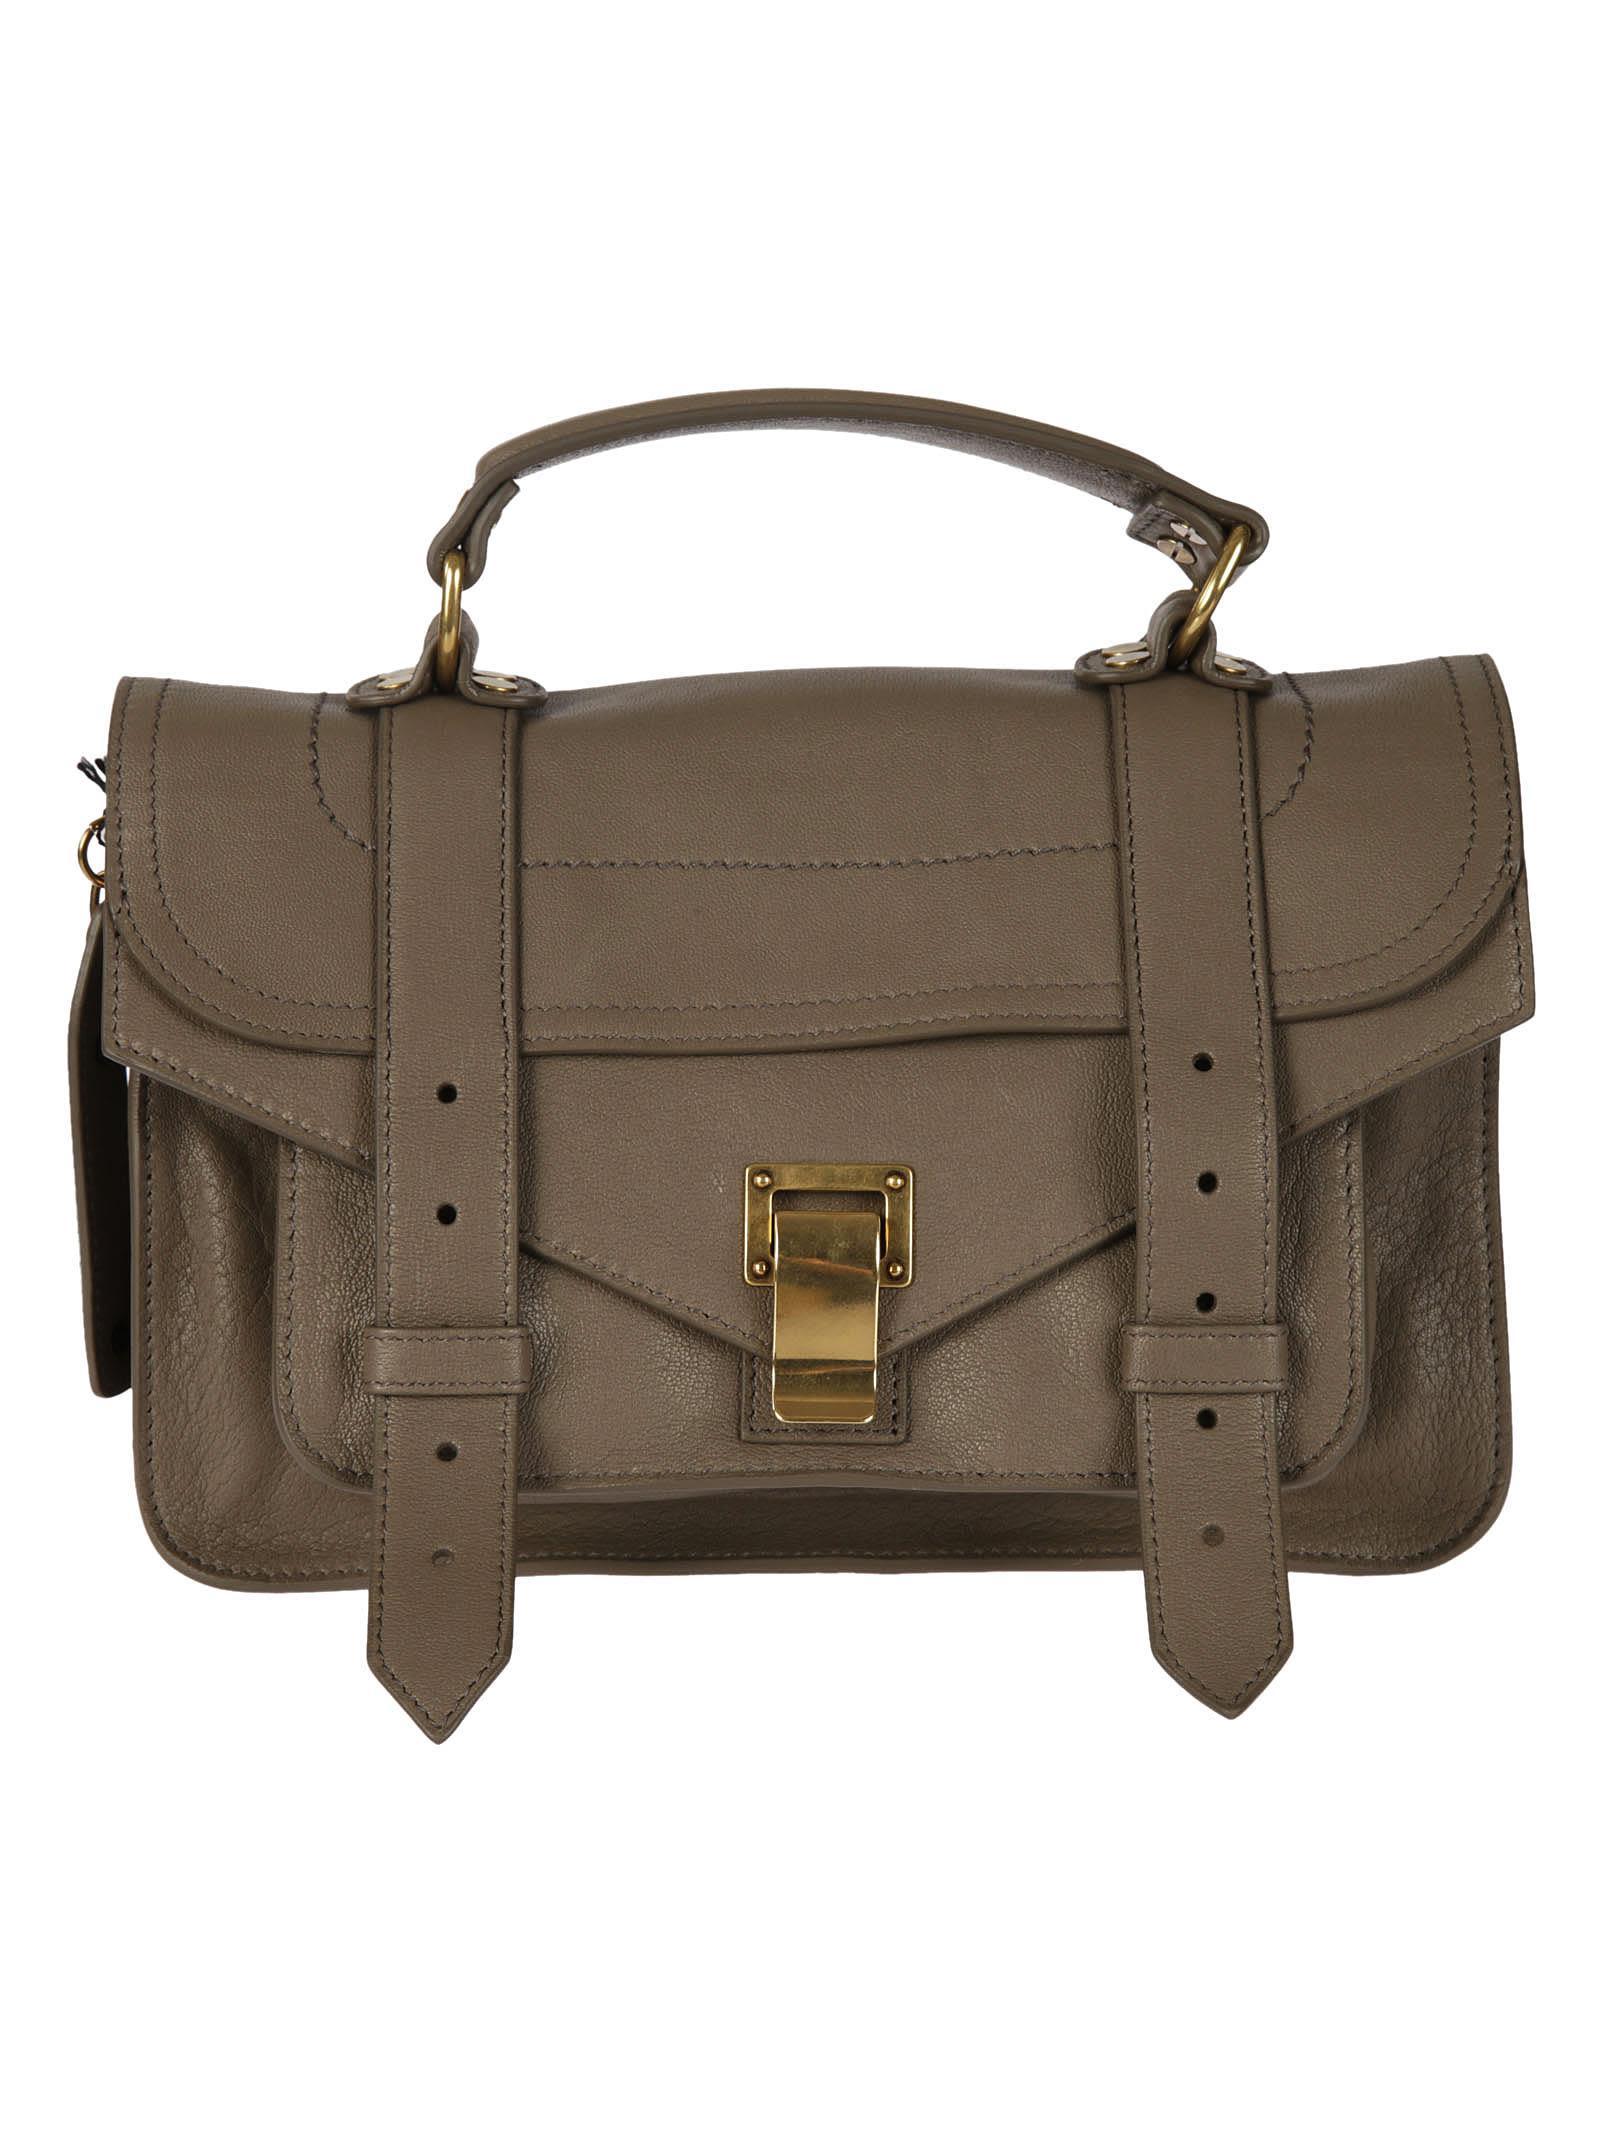 Proenza Schouler Tiny Ps1 Shoulder Bag In Basic   ModeSens 7f7225816b